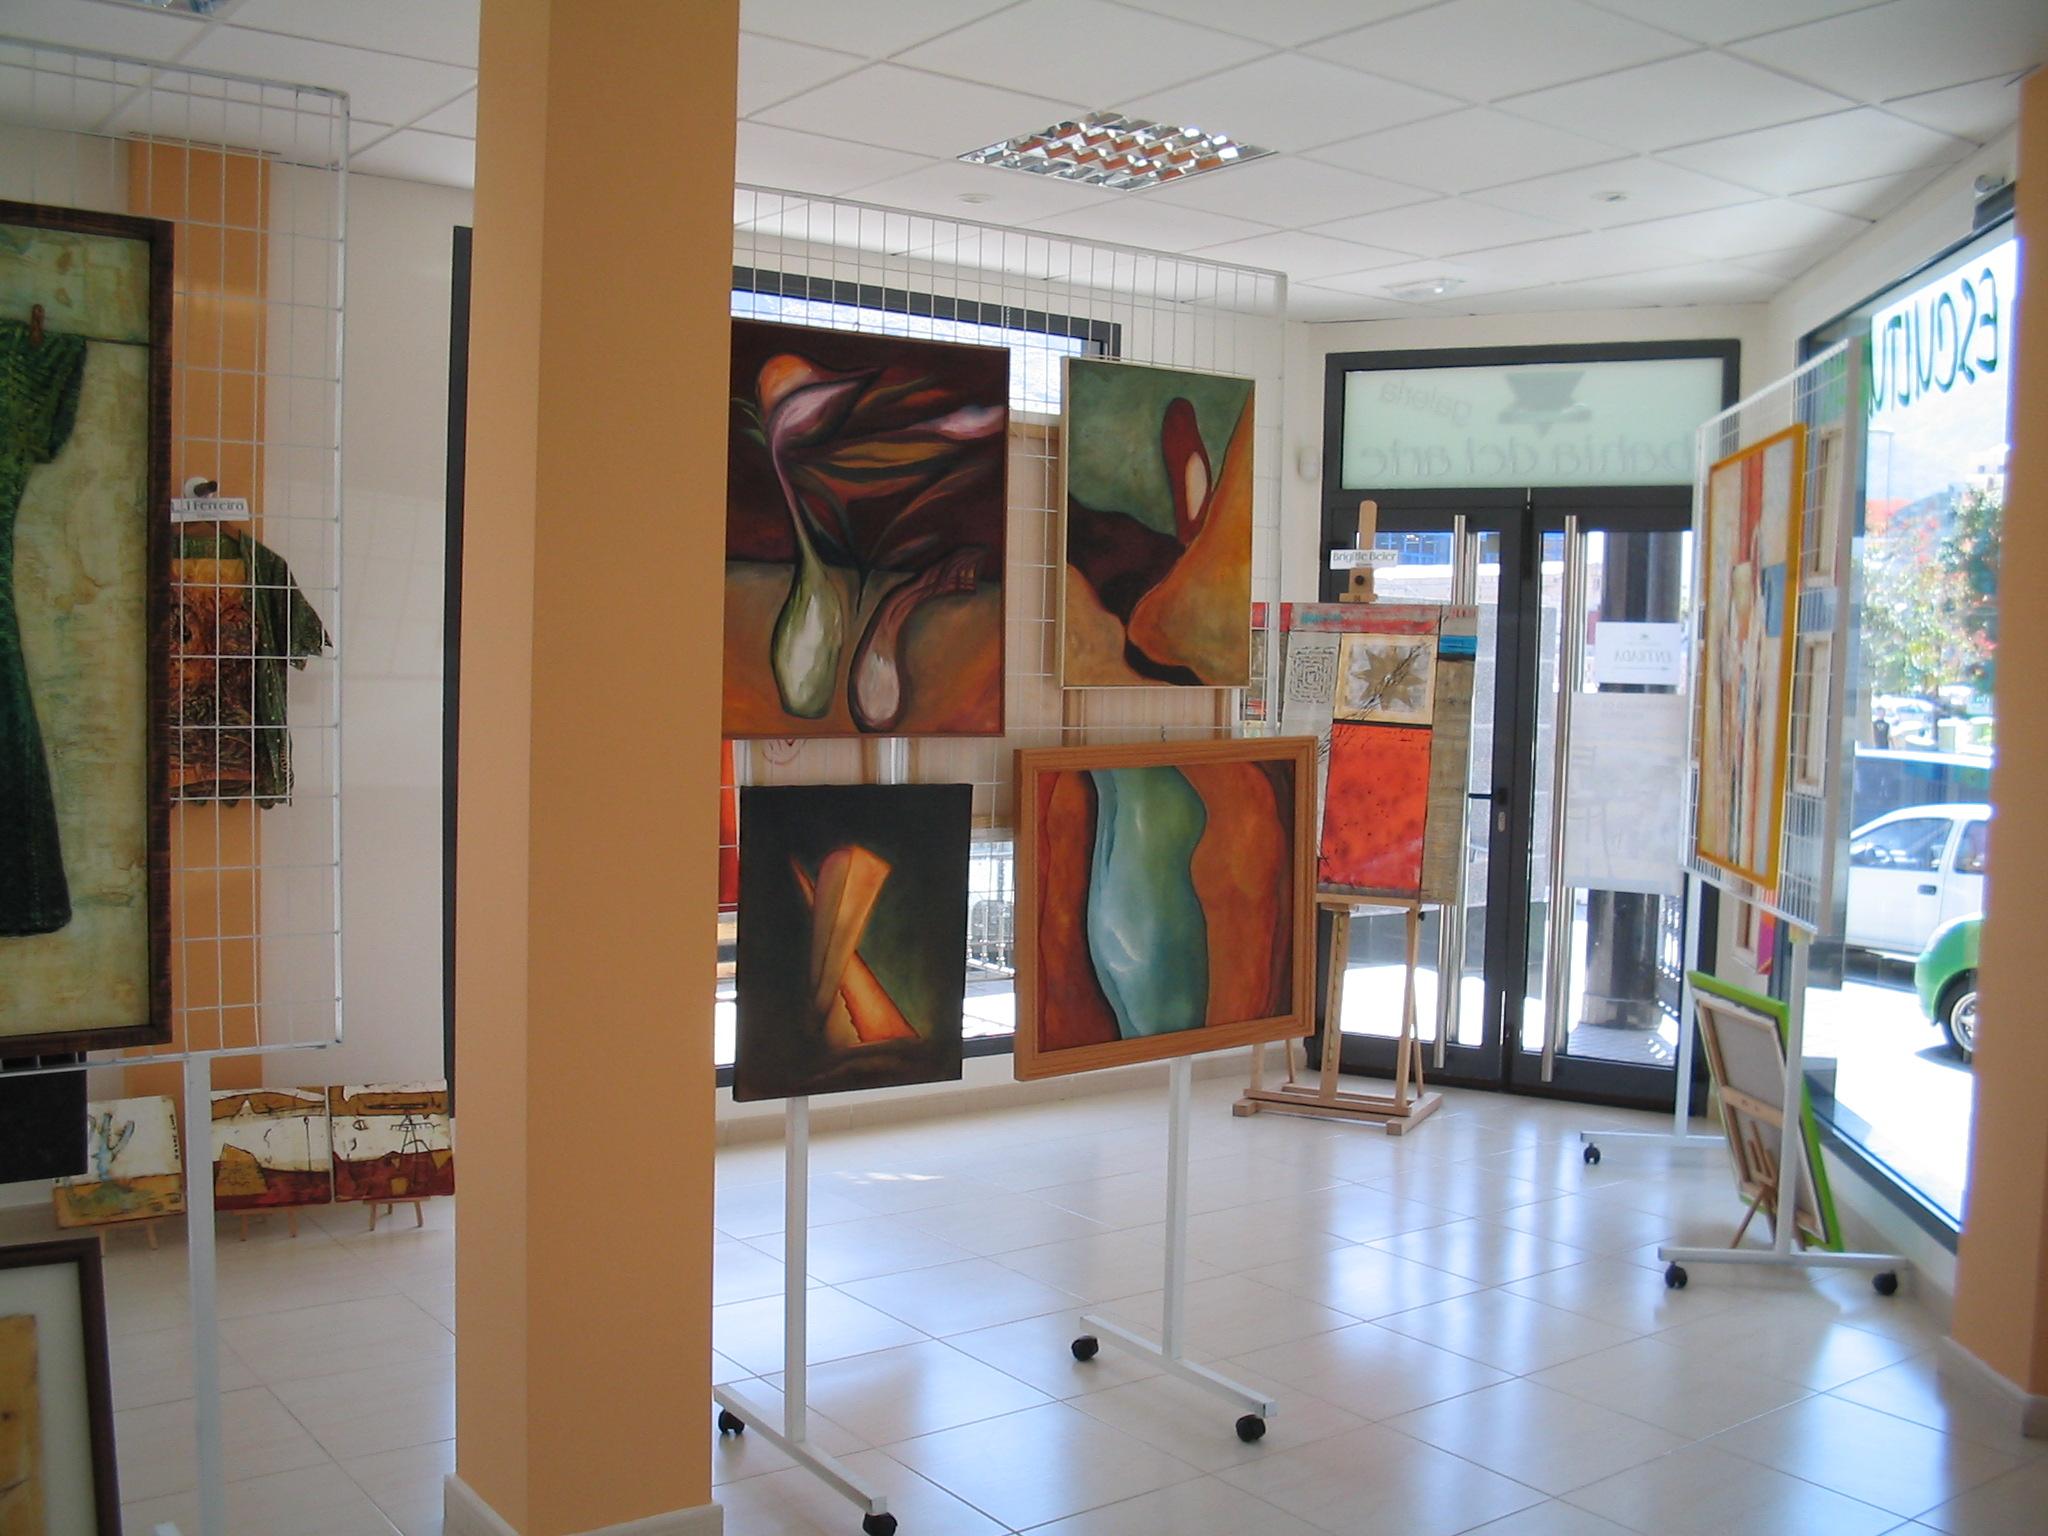 Teneriffa 2005 - Adeje Galeria Bahia del Arte